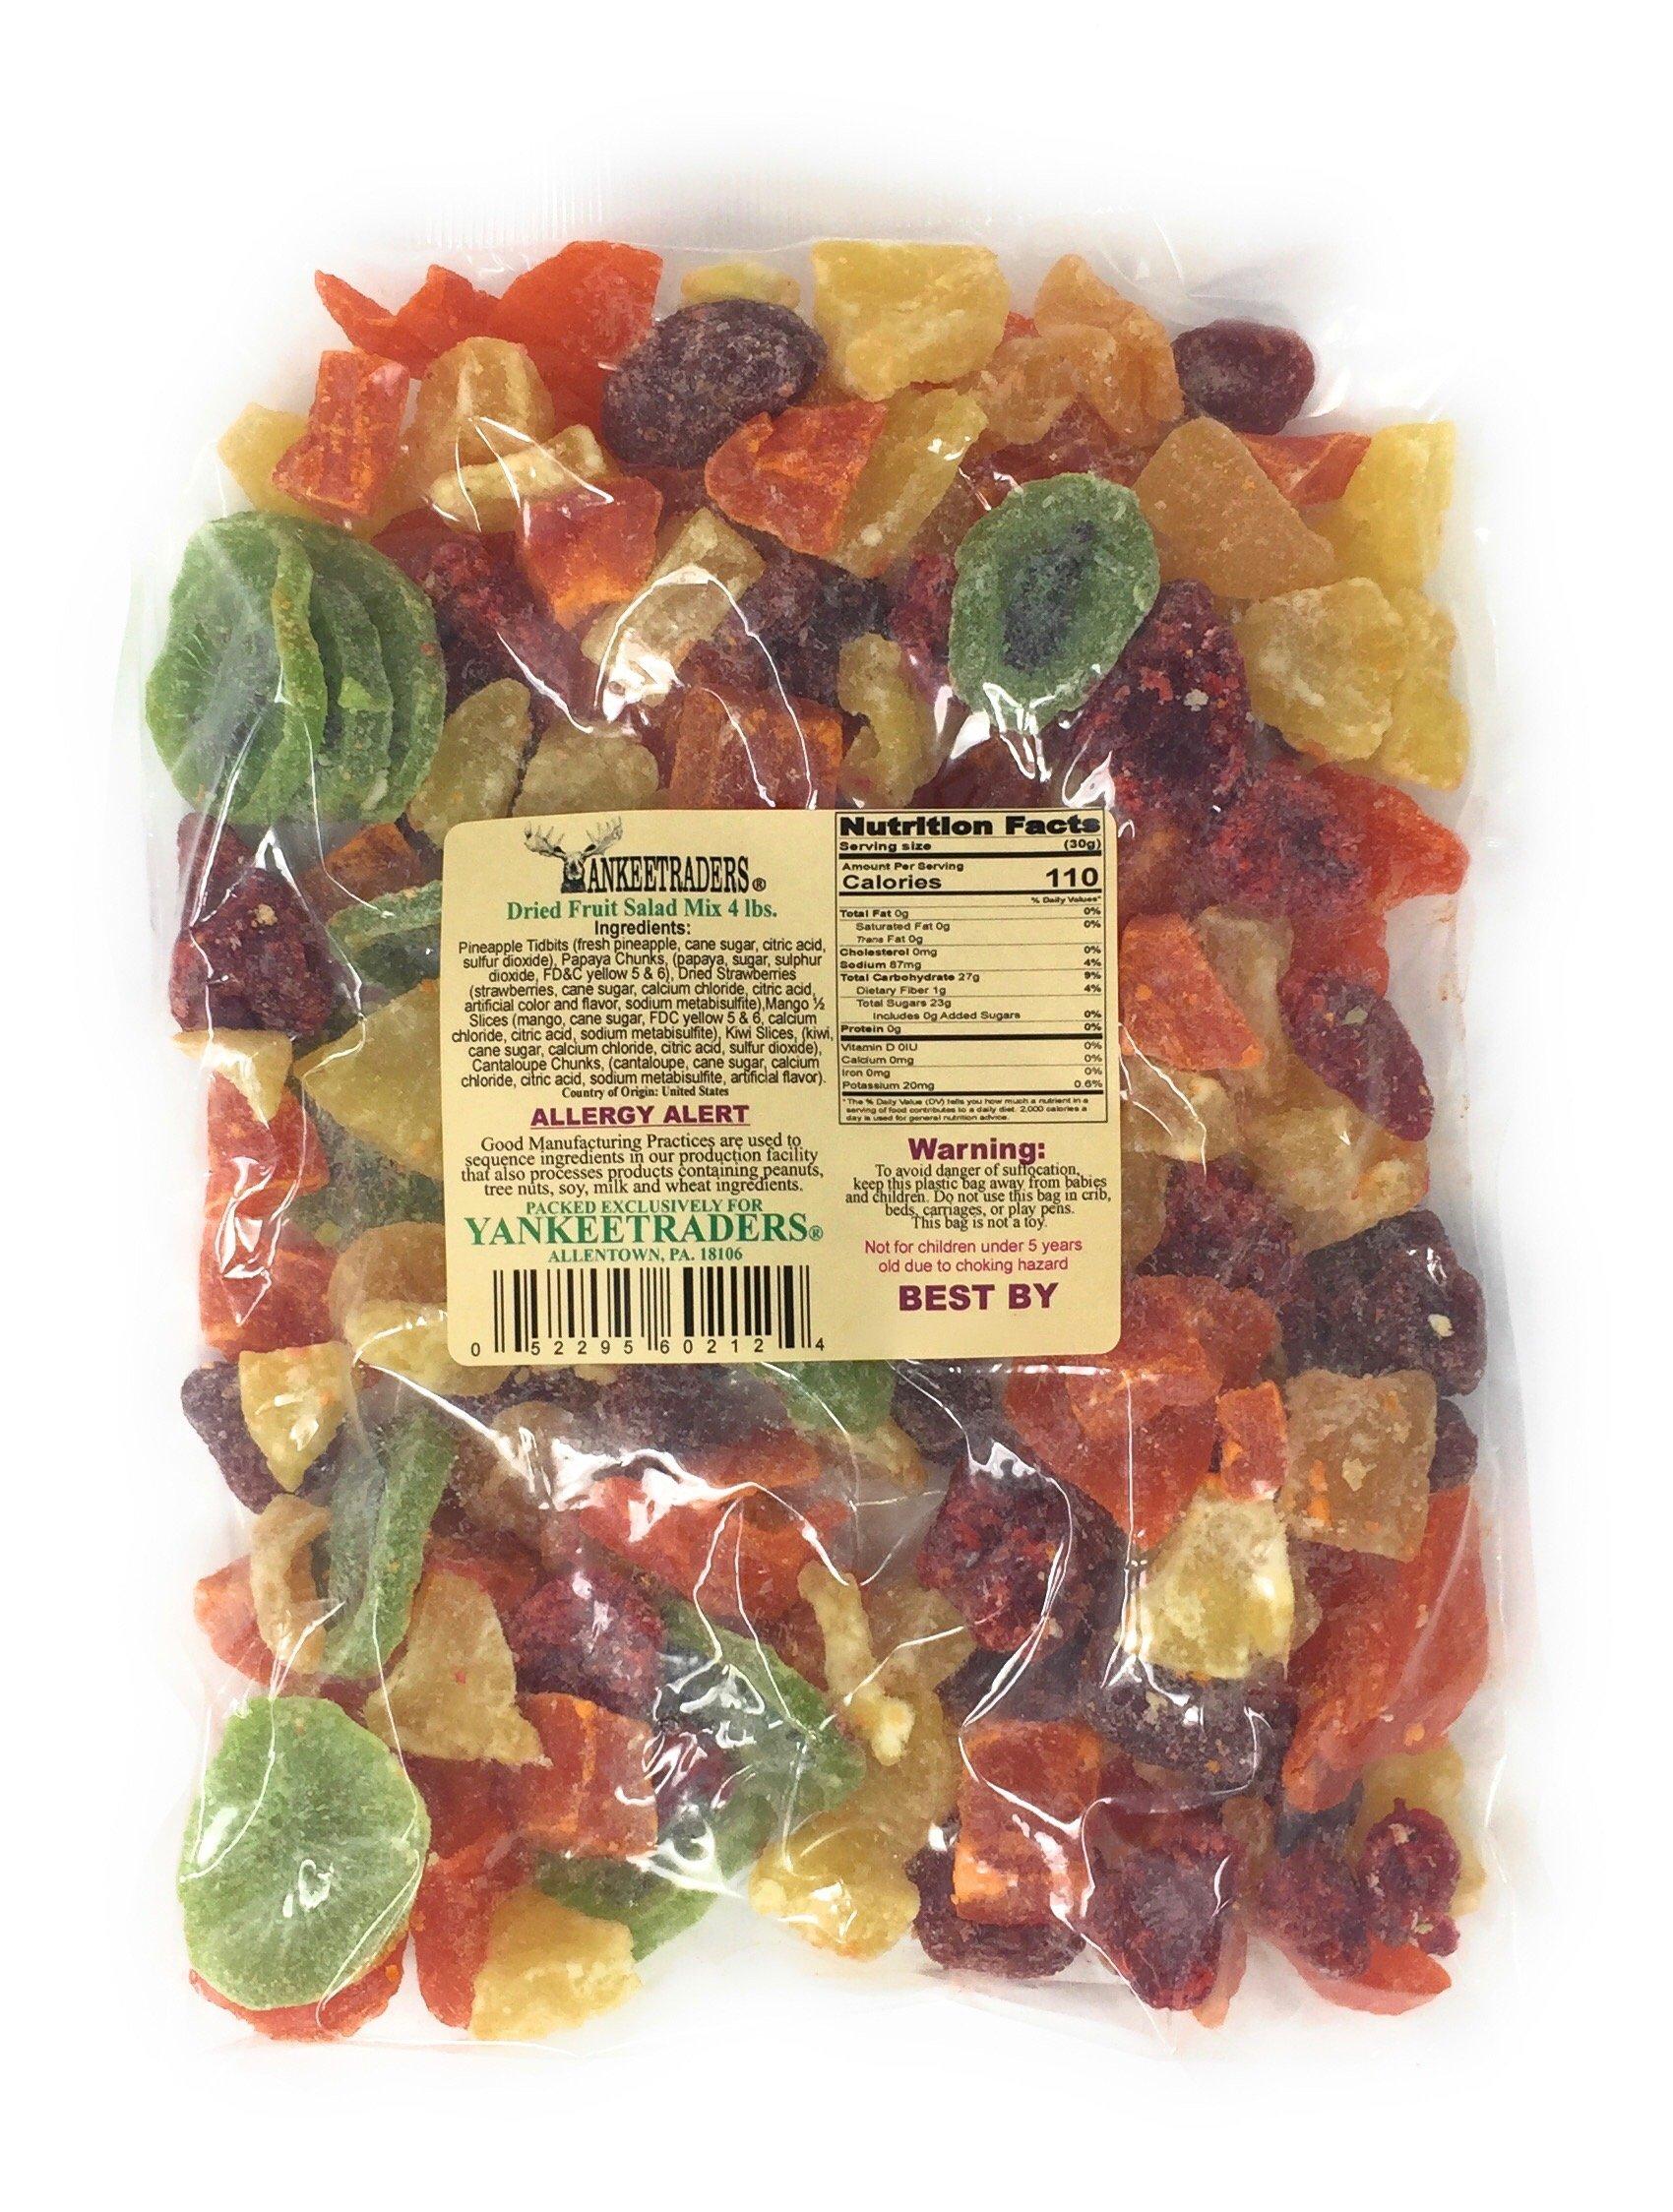 Yankee Traders Dried Fruit Mix Fruit Salad, 4 Pound